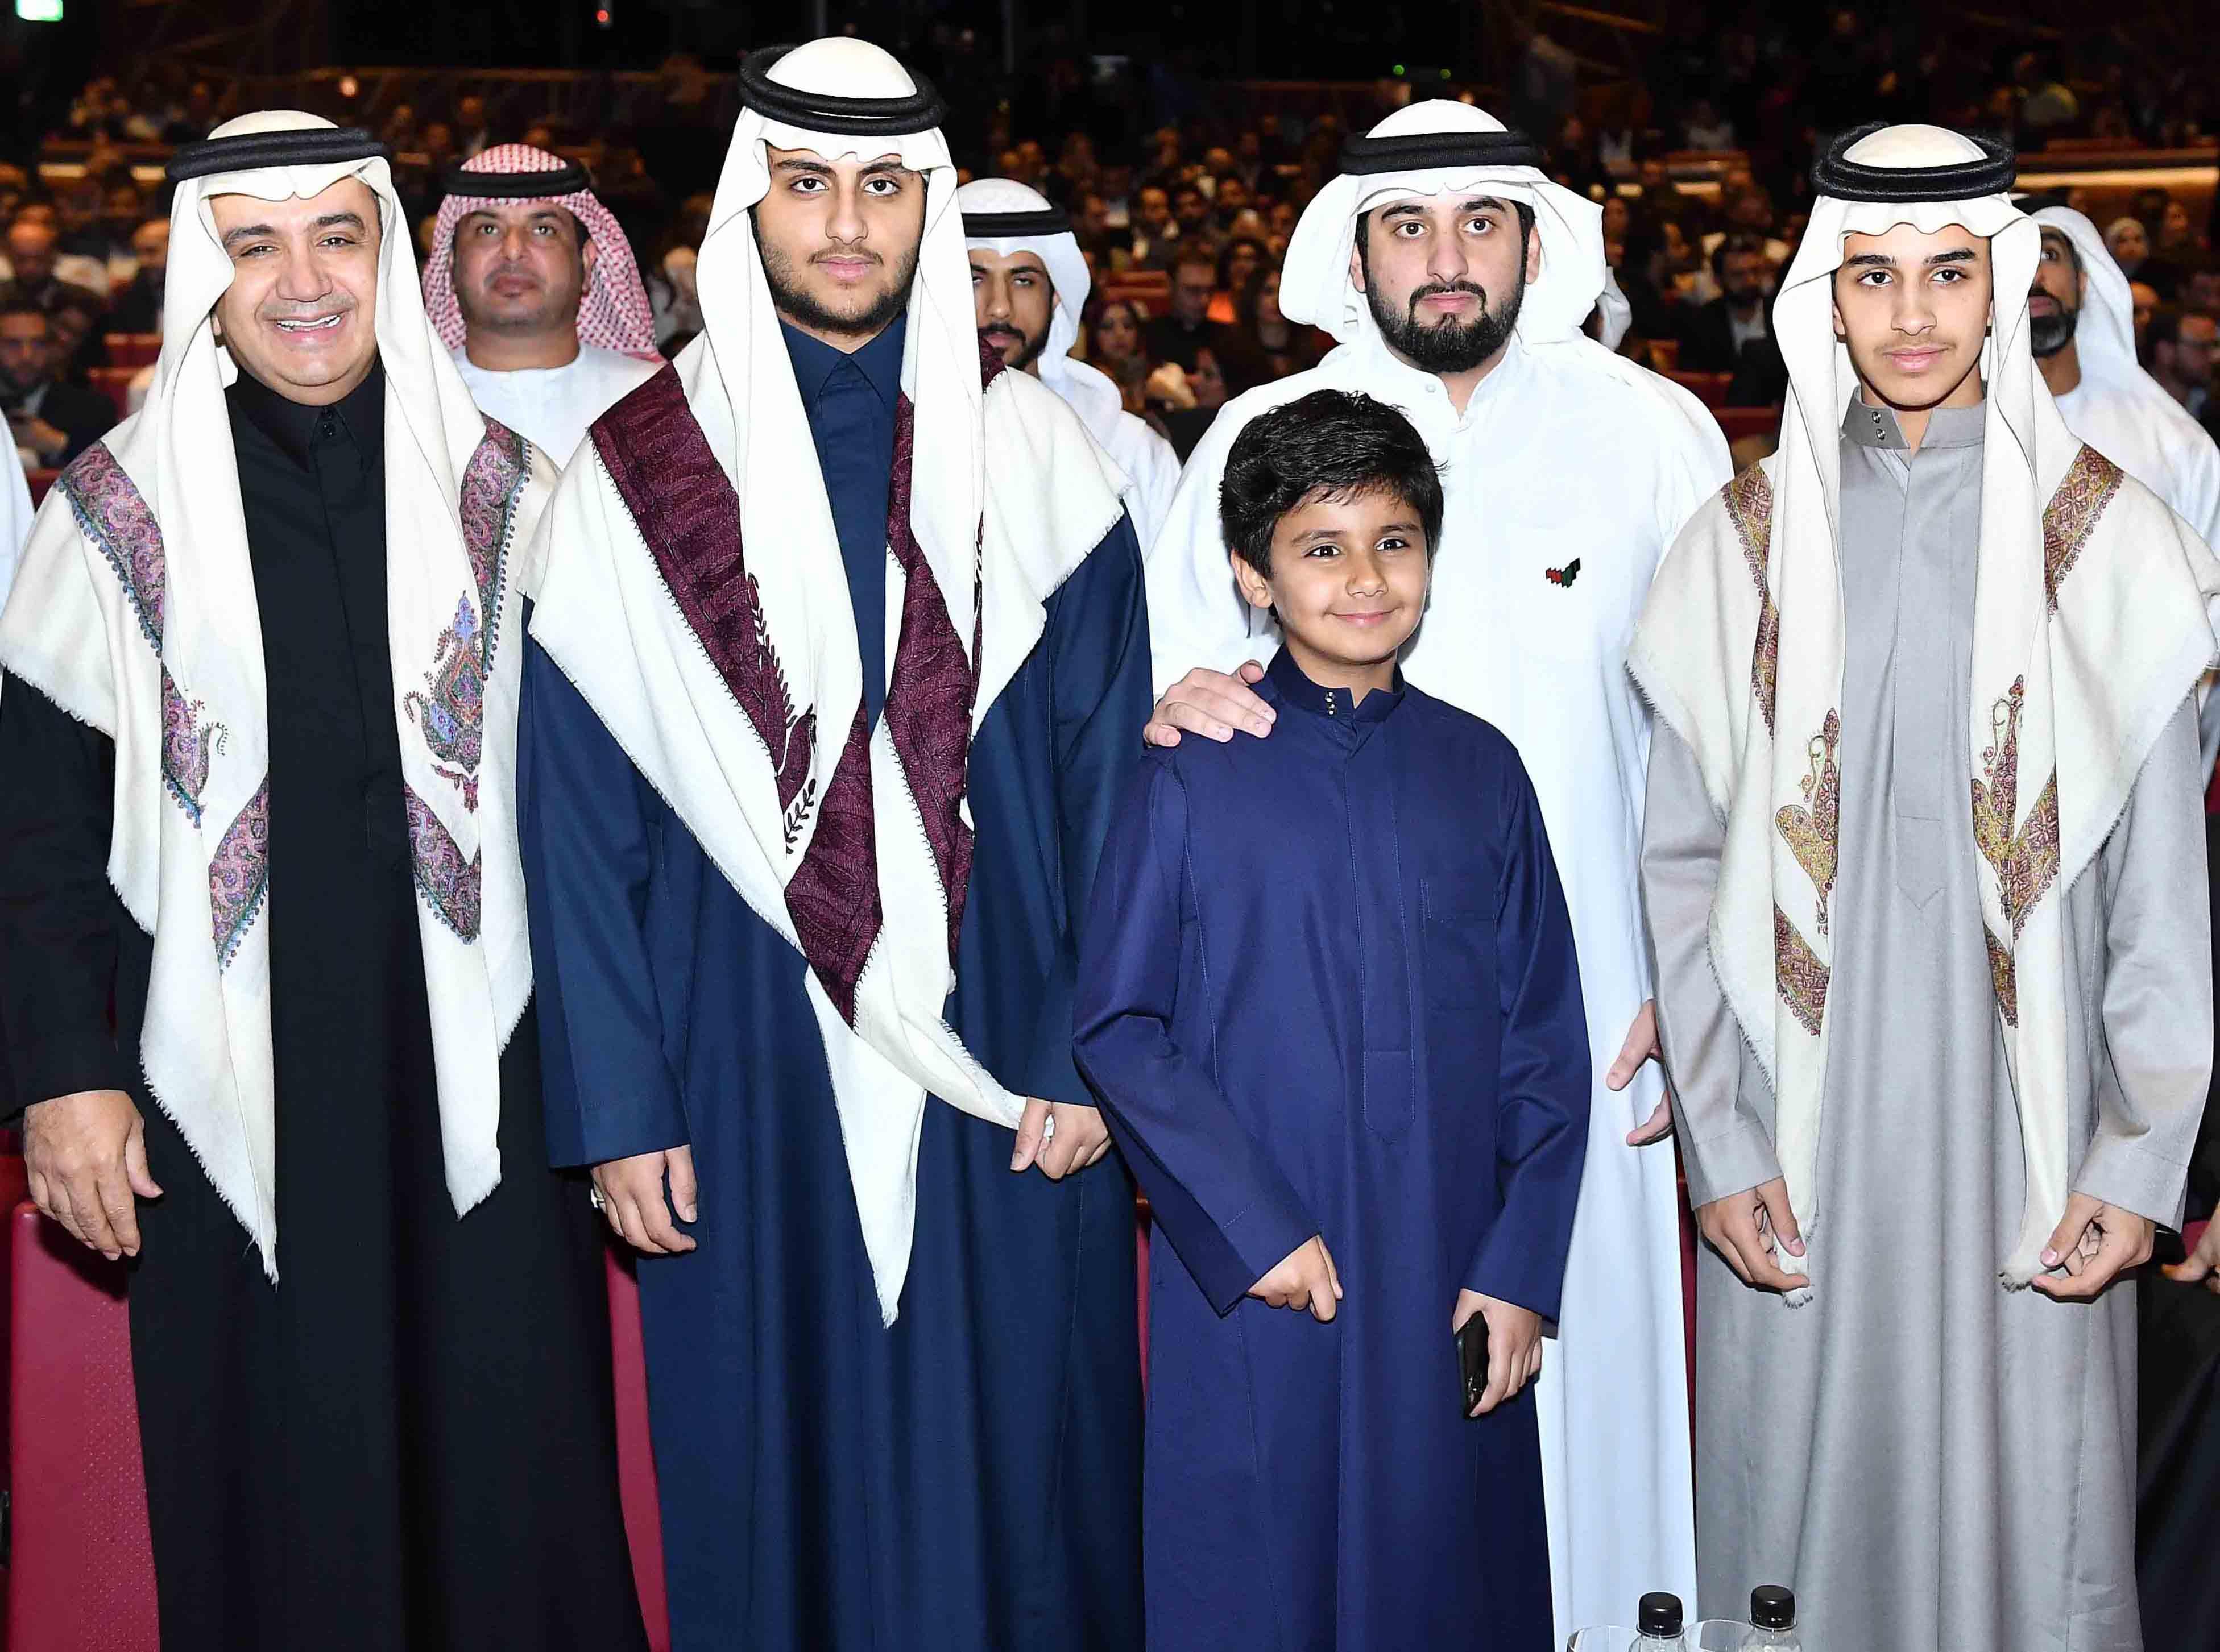 Shahid re-launch event - HH Sheikh Ahmad Bin Mohammed Bin Rashid Al Maktoum & Sheikh Walid Al Ibrahim